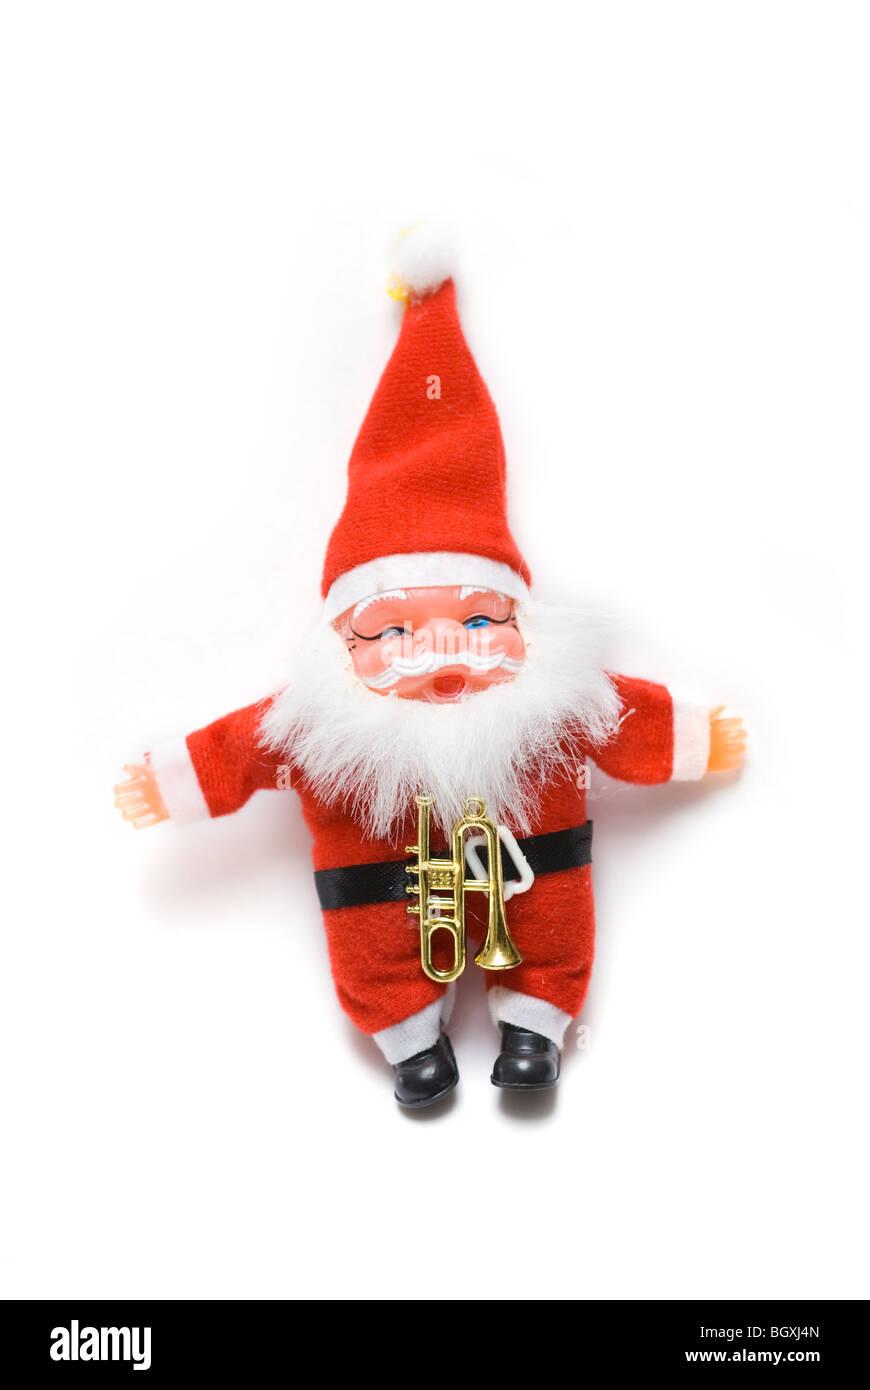 Santa Claus isolati su sfondi bianchi Immagini Stock